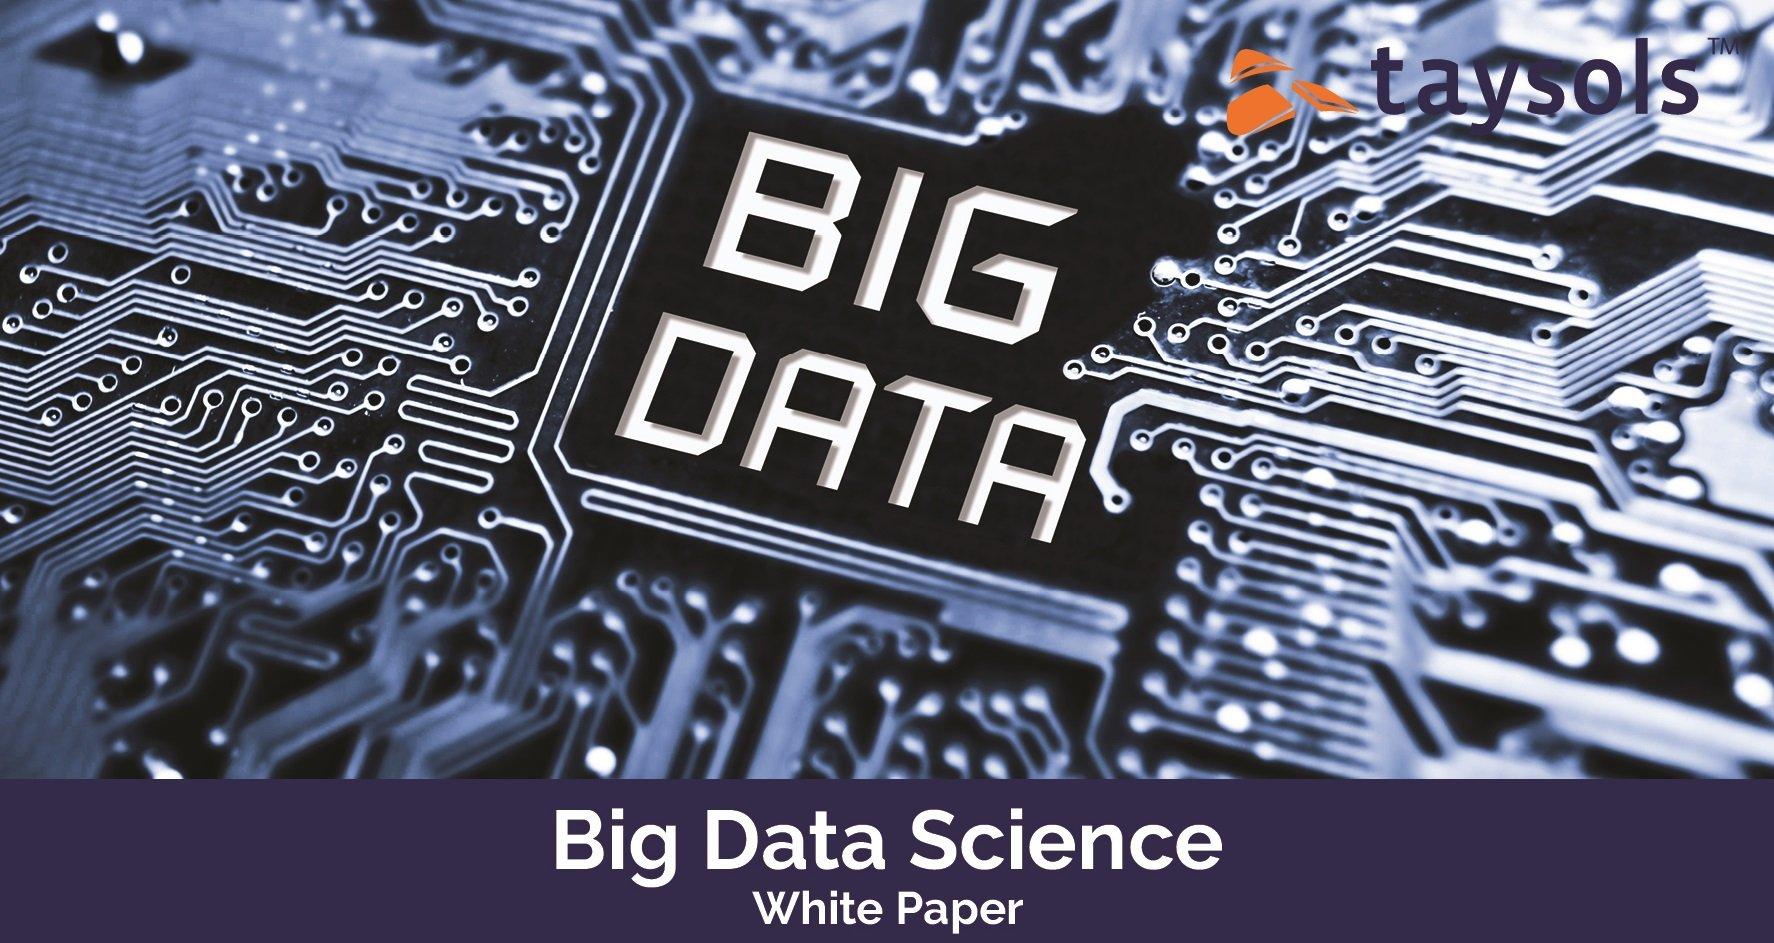 taysols_white paper_big data science